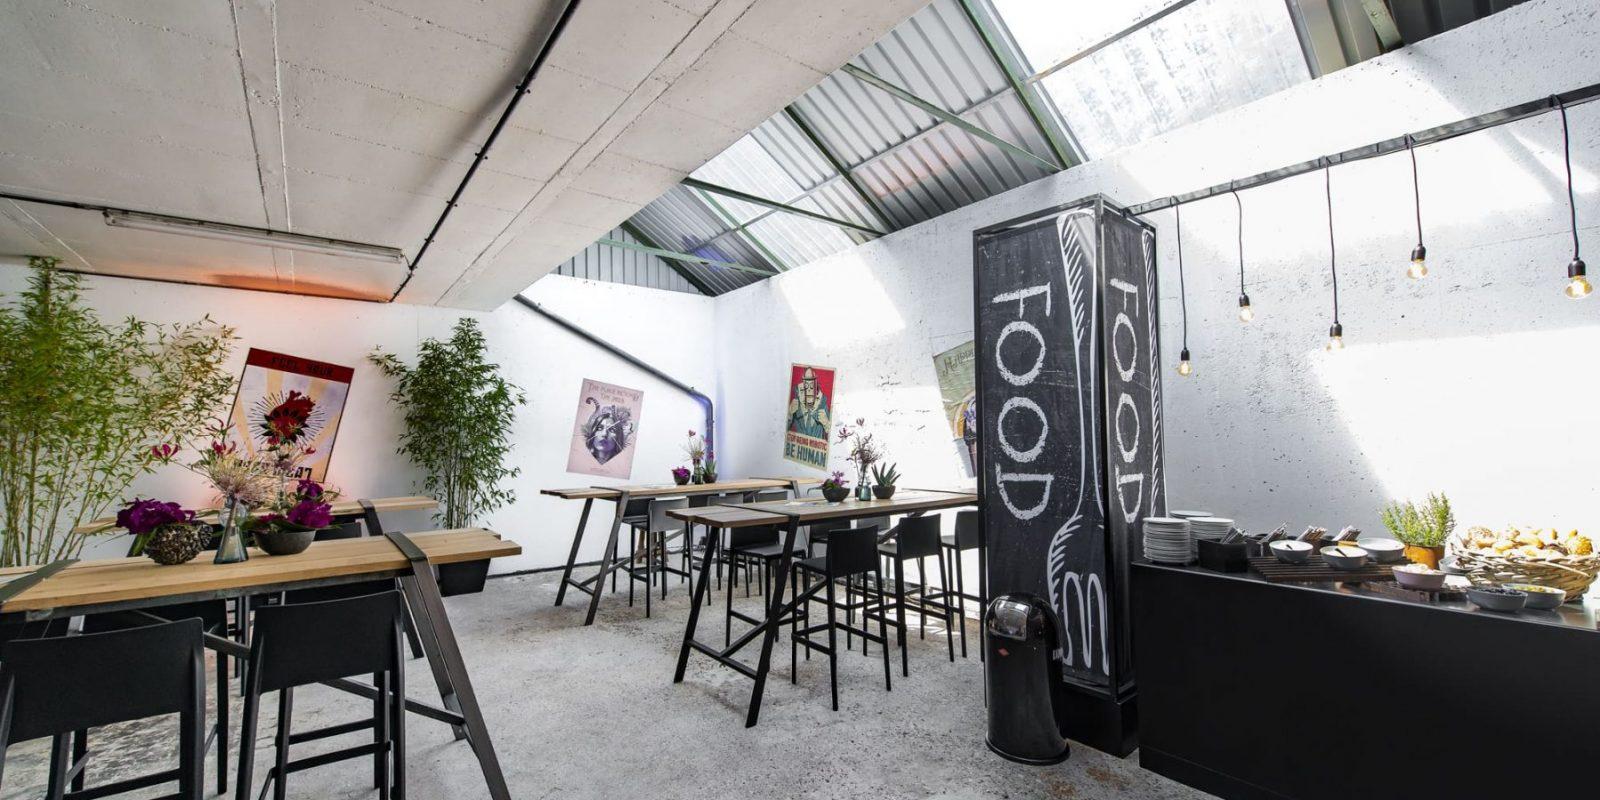 Bas de Boer Eventstyling Parookaville Festival 2019 Artistvillage Backstage Hochtisch Buffetstation Buffetttisch Buffetbeleuchtung Buffetbeschilderung www.basdeboer eventstyling.de 086 1600x800 - Parookaville Festival 2019